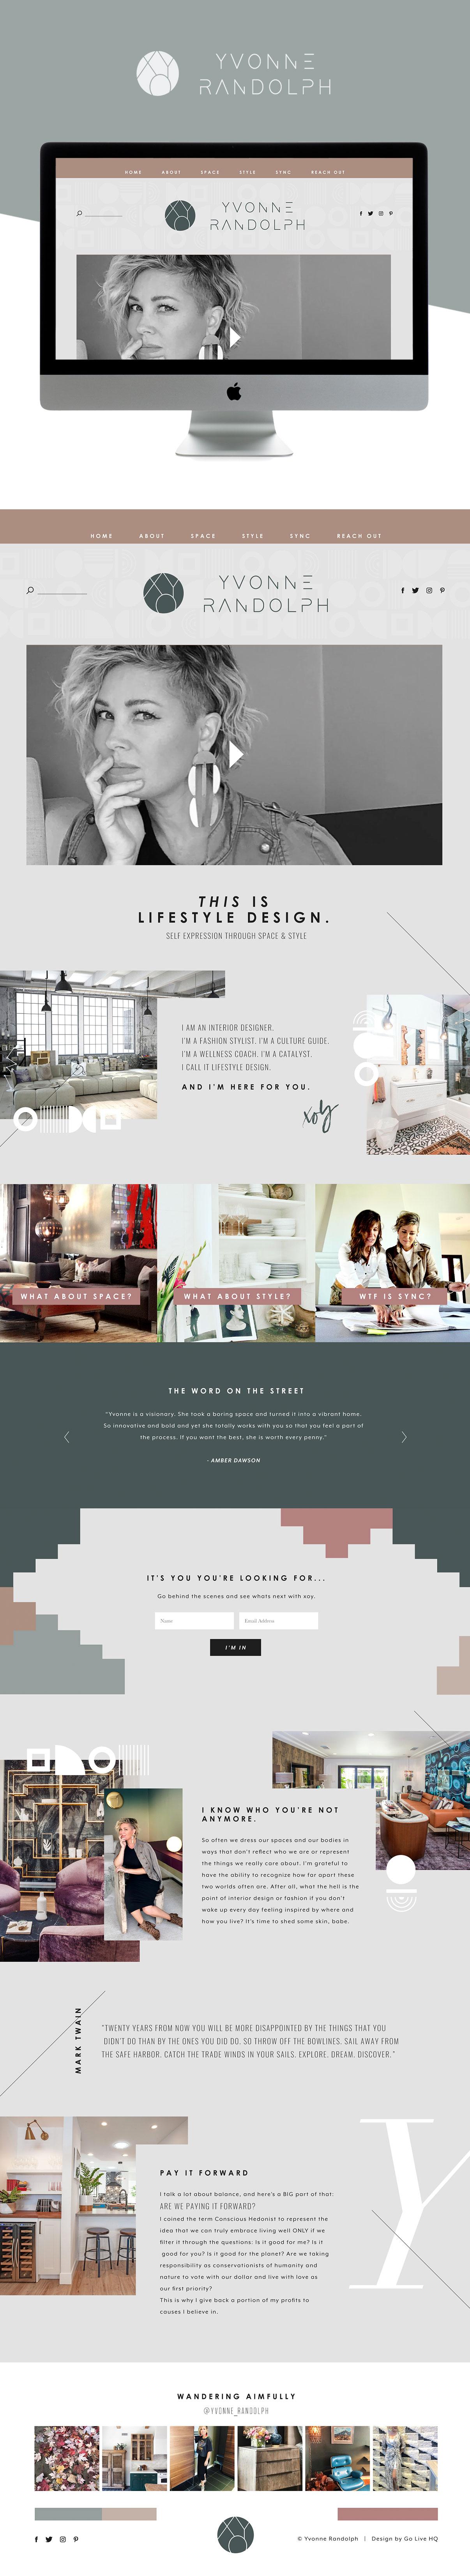 Sophisticated, edgy and modern website design for home designer   Website Design By Go Live HQ